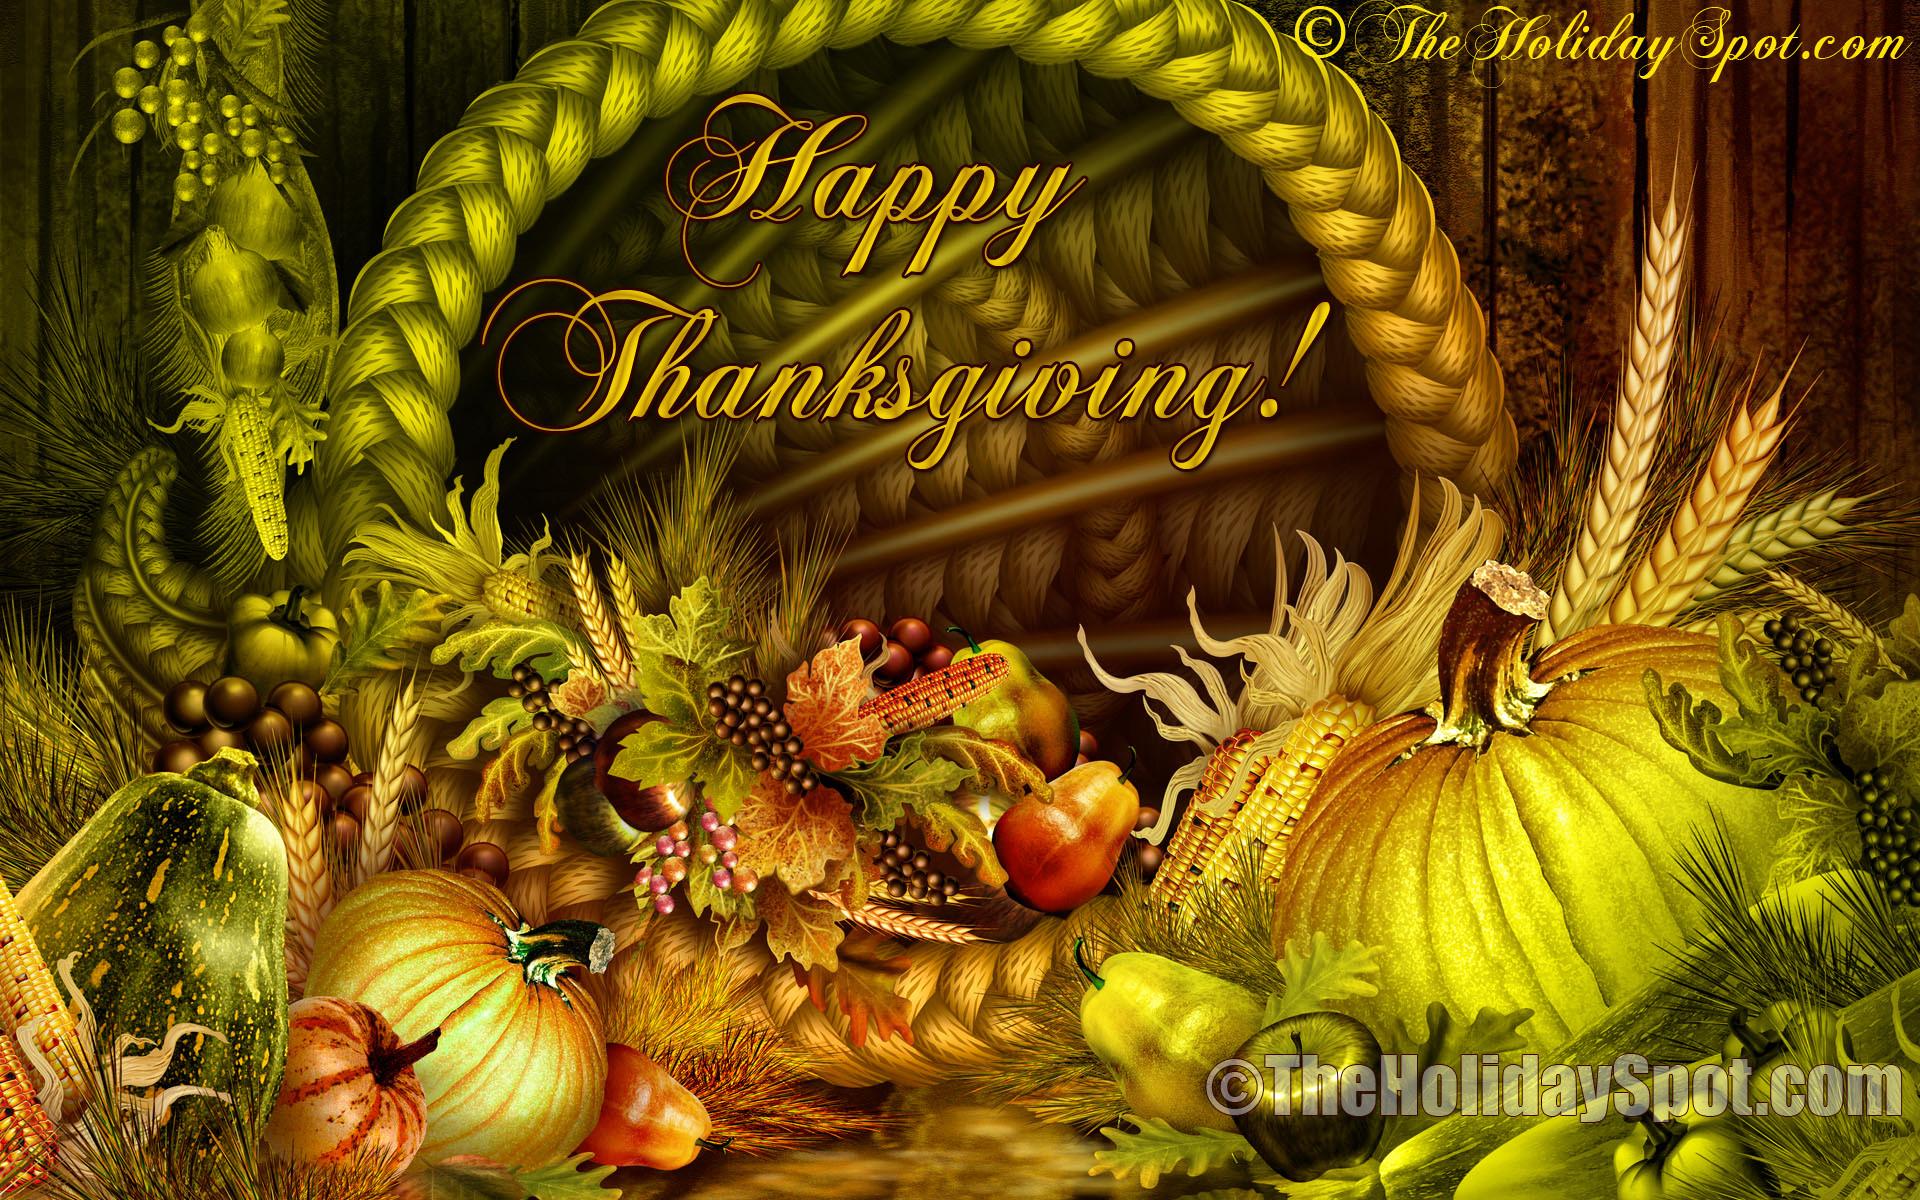 Thanksgiving Turkey Wallpaper  Download Free Desktop 2011 Thanksgiving Wallpaper